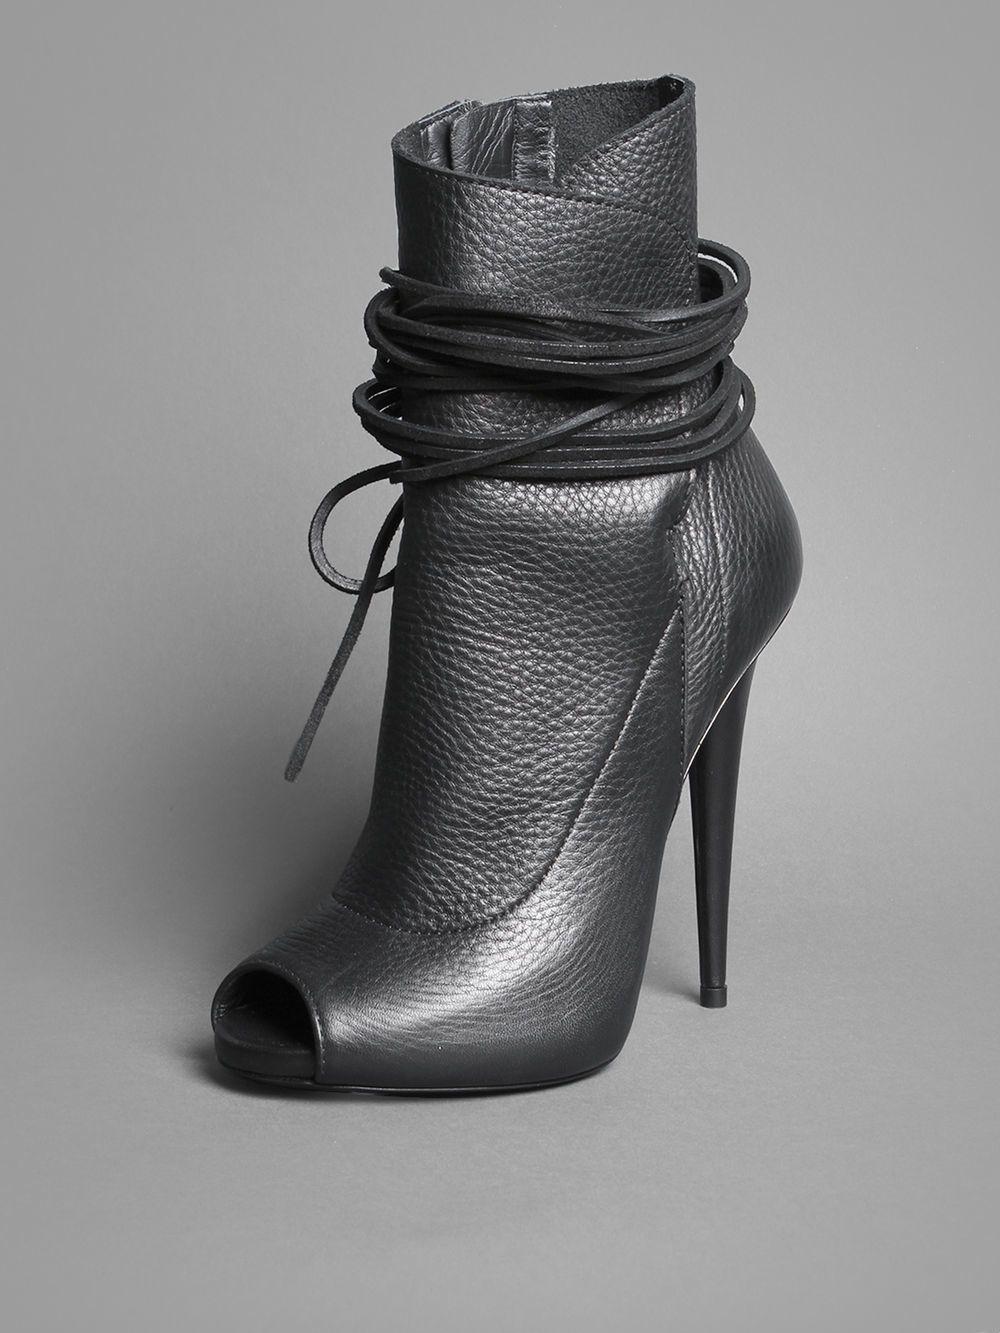 04f04b859e0 Antonioli Online Boutique - Antonioli.eu Mules Talons, Talons Sexy, Women's  Shoes,